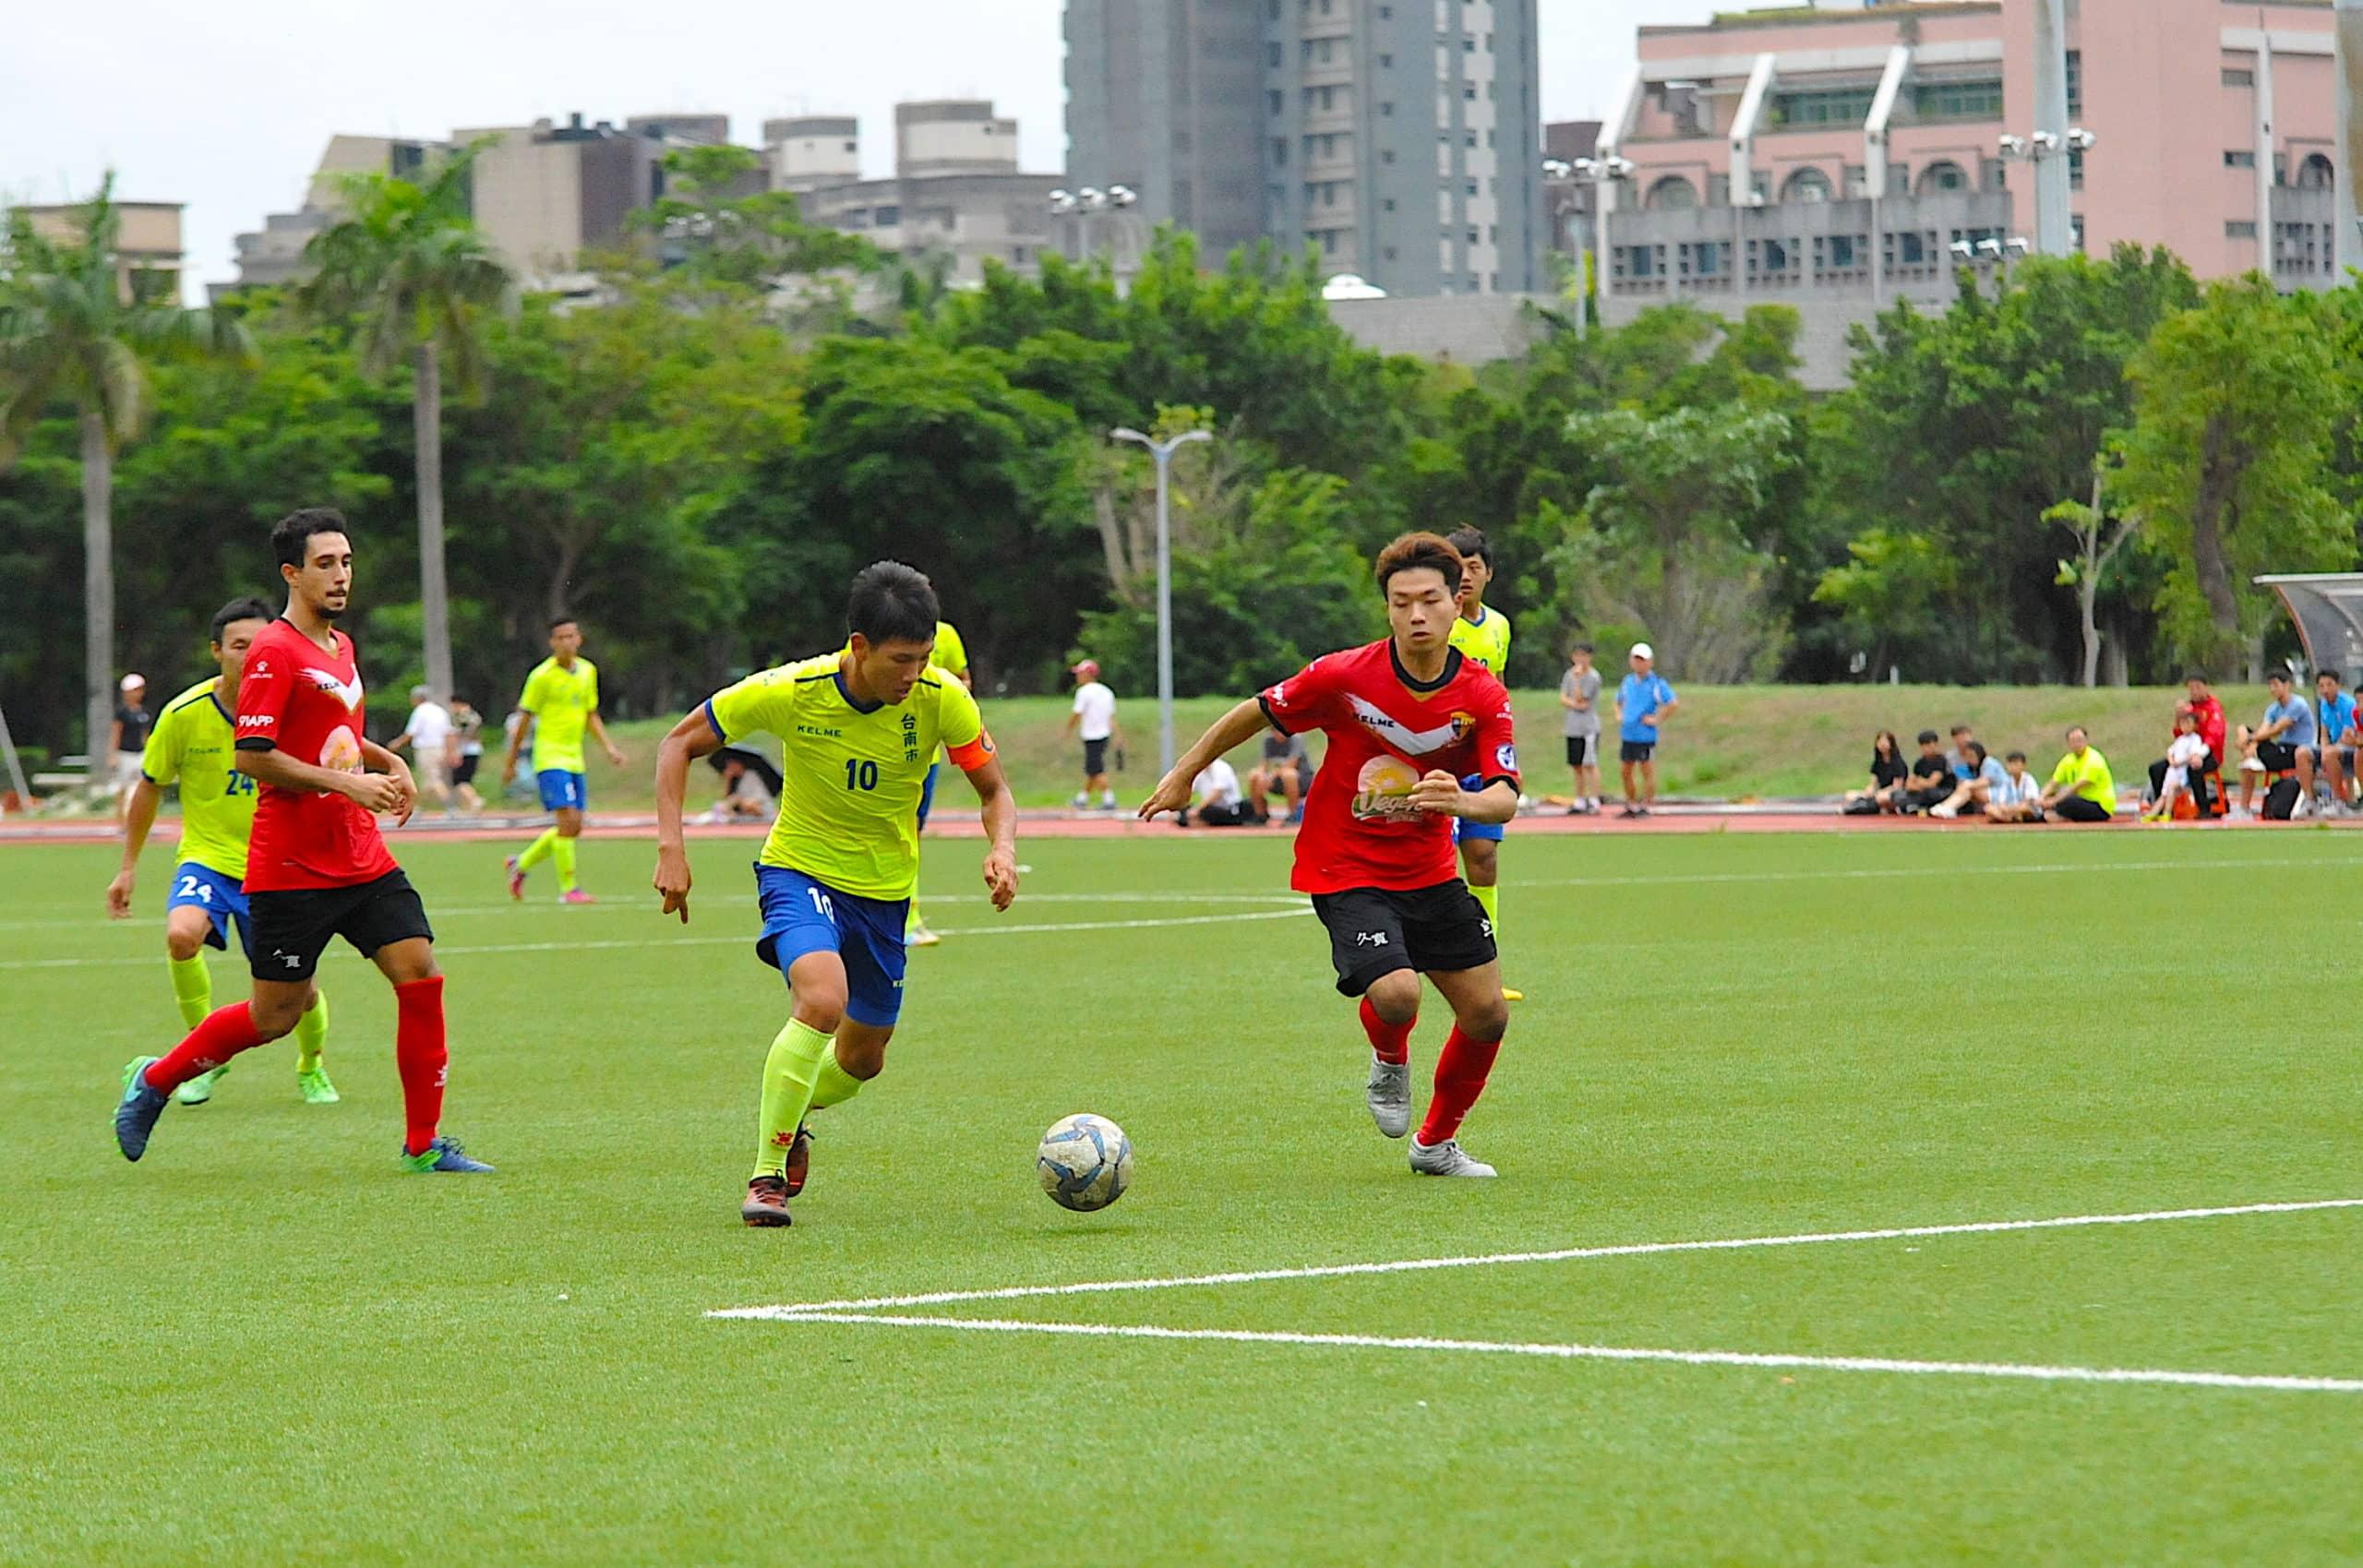 soi-keo-red-lions-vs-taipower-vao-15h-ngay-3-5-2020-1